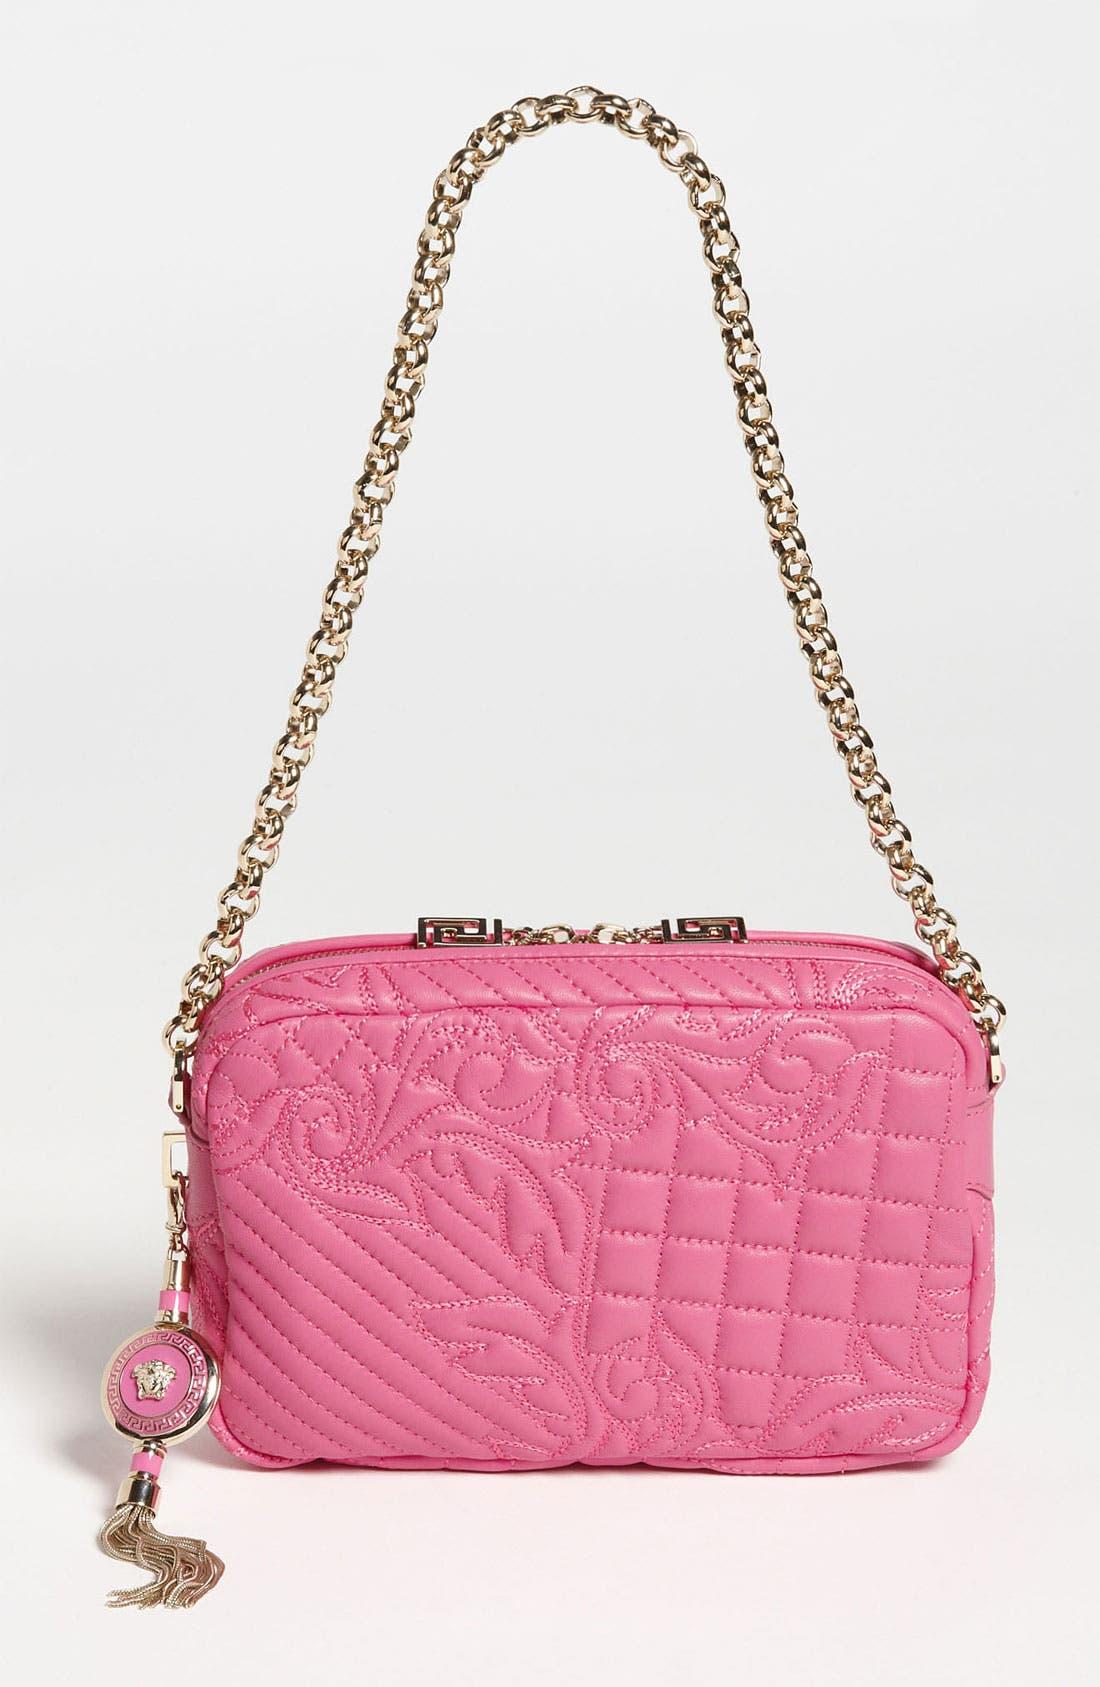 Main Image - Versace 'Vanitas' Embroidered Leather Shoulder Bag